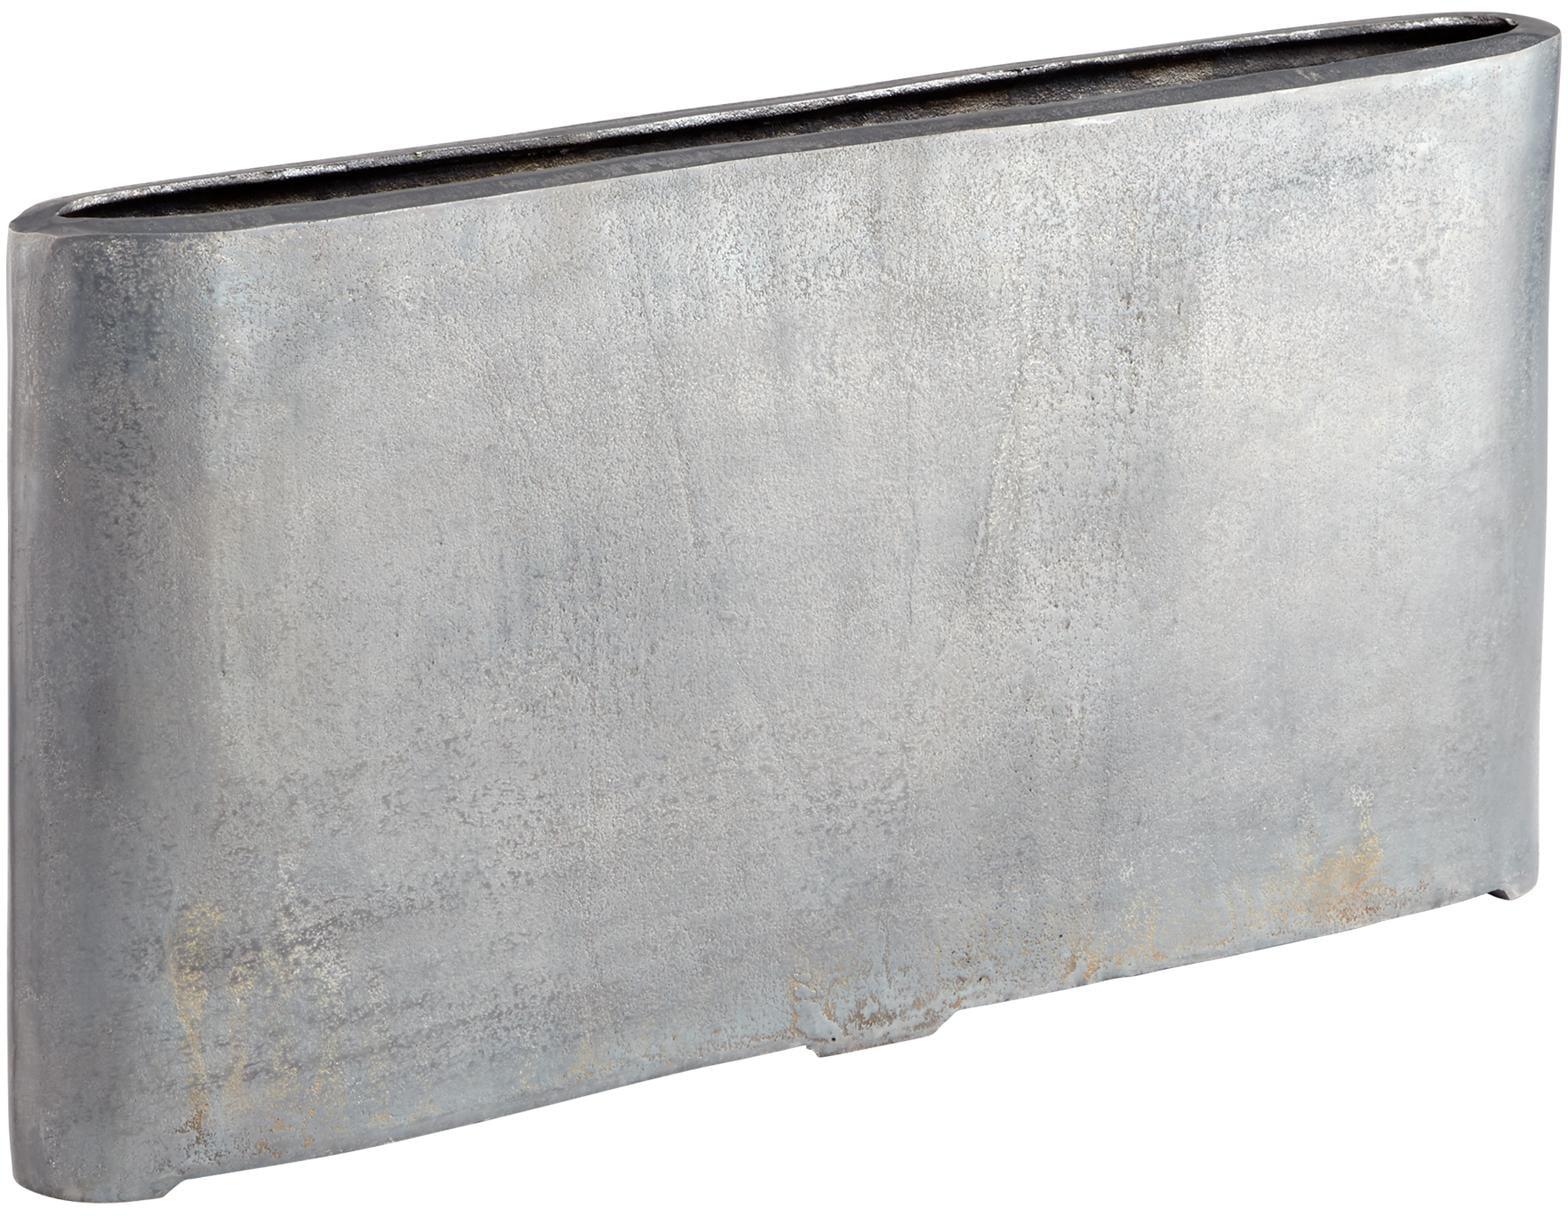 Planter CYAN DESIGN FELICITY Large Zinc Aluminum New CY-3066 by Garden Planters